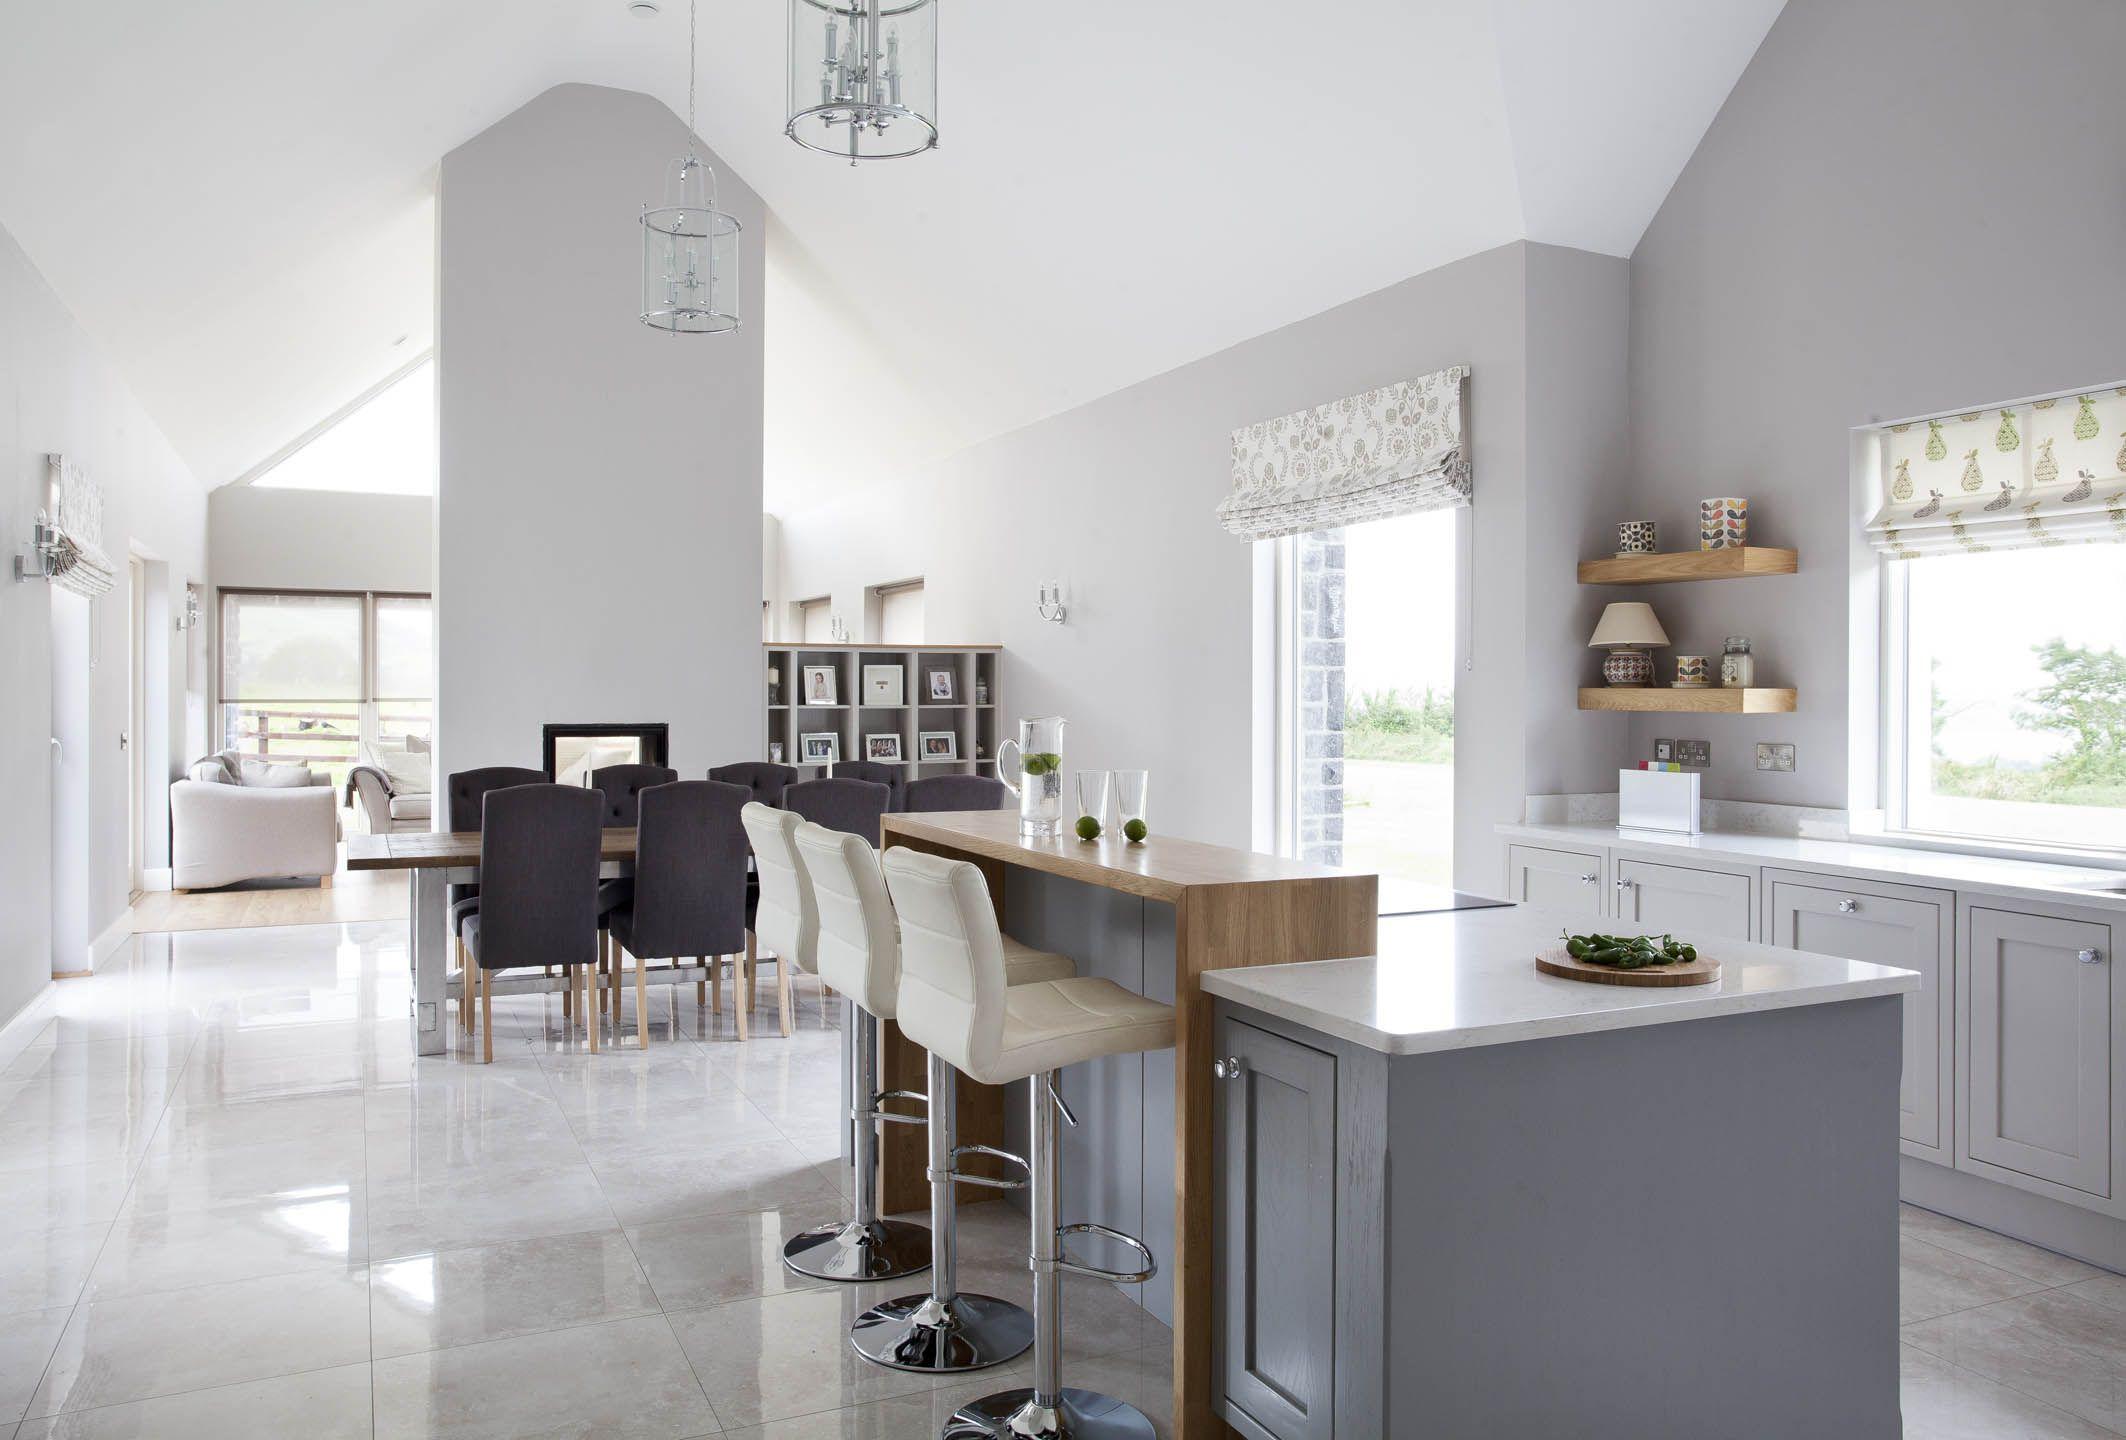 Bespoke Kitchen Handpainted In Farrow & Ball Cornforth White With